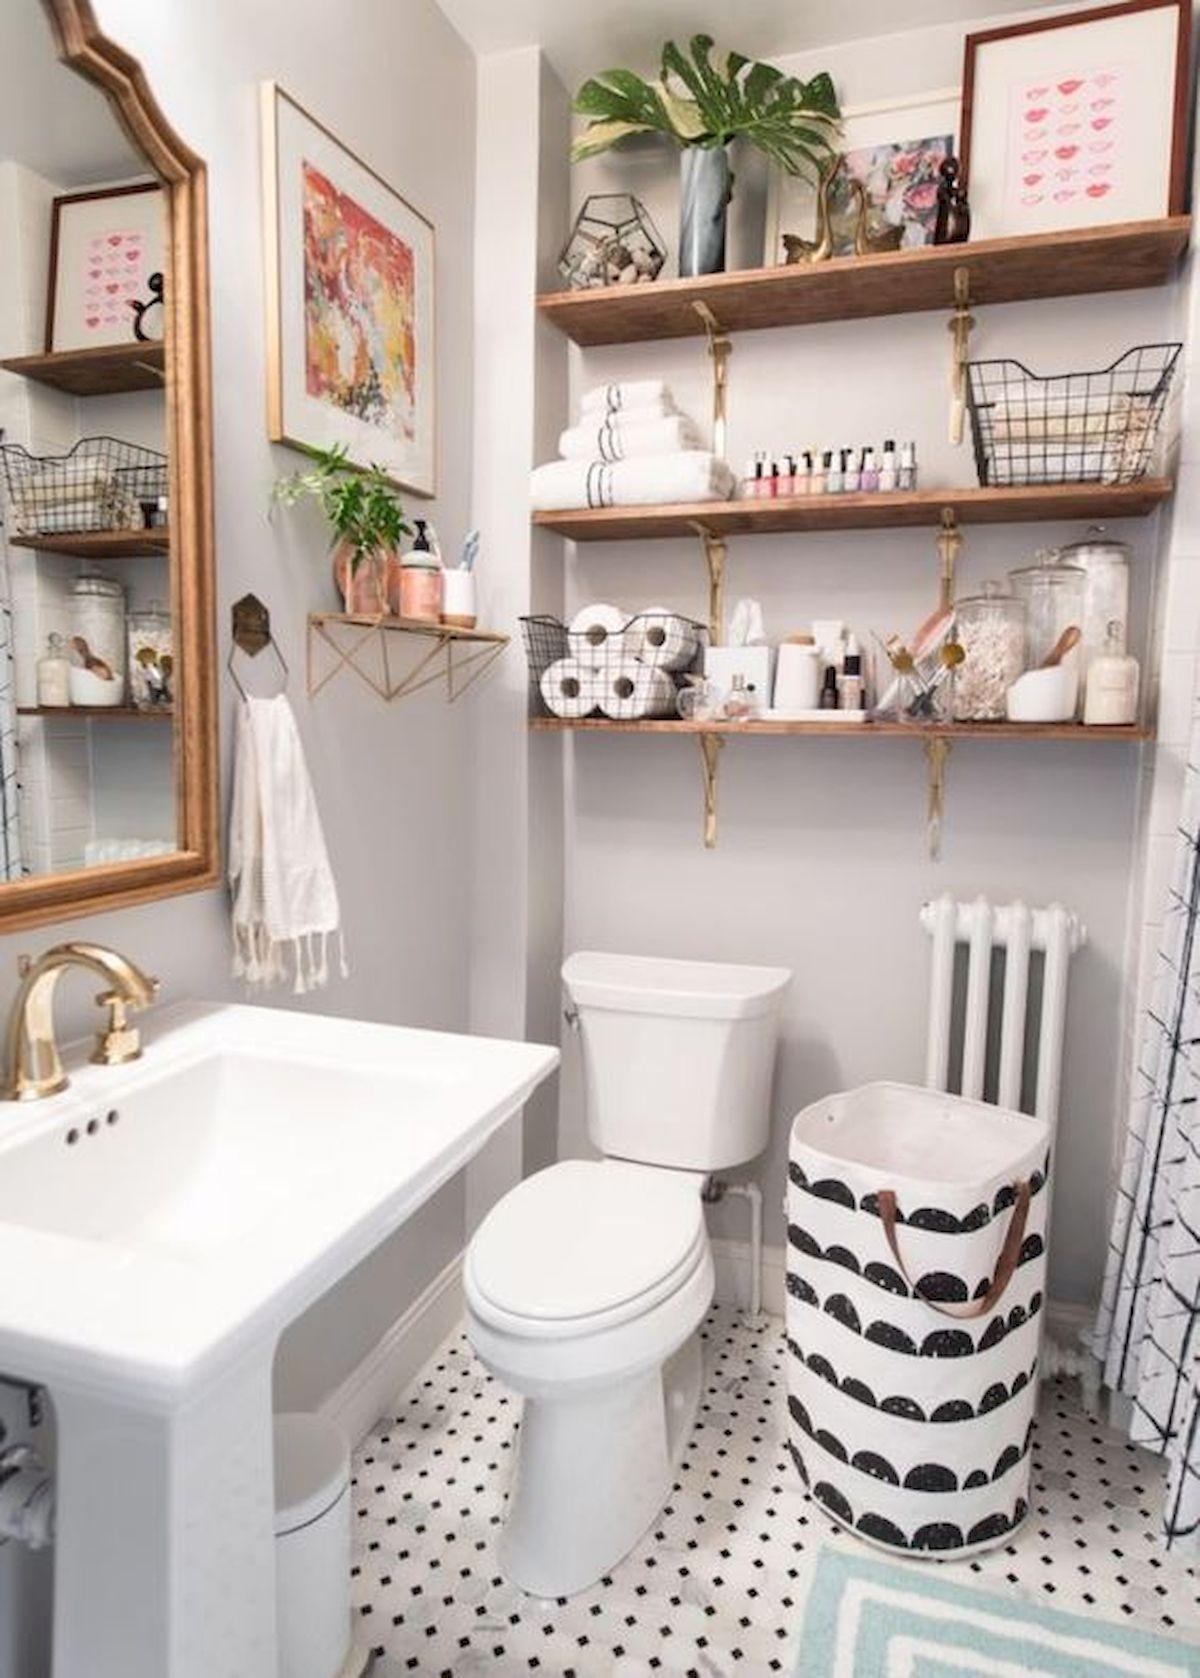 25 Creative Bathroom Storage Ideas For Small Spaces 14 Classic Small Bathrooms Small Bathroom Furniture Small Bathroom Decor